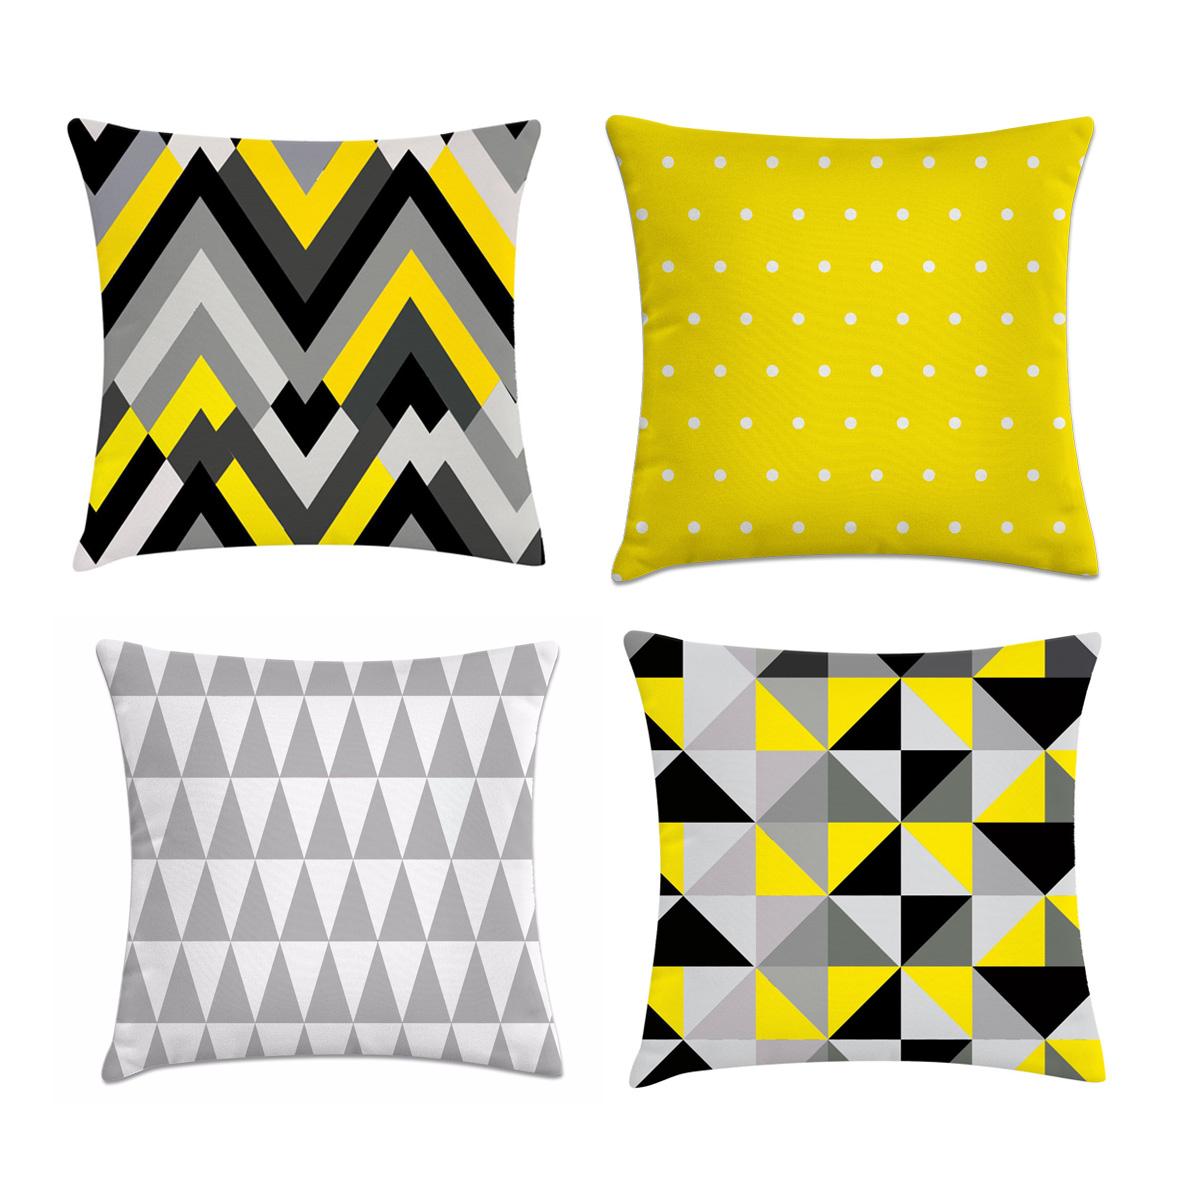 05b216f9fda5c8 kit 4 capas de almofadas geométrica preto e amarelo